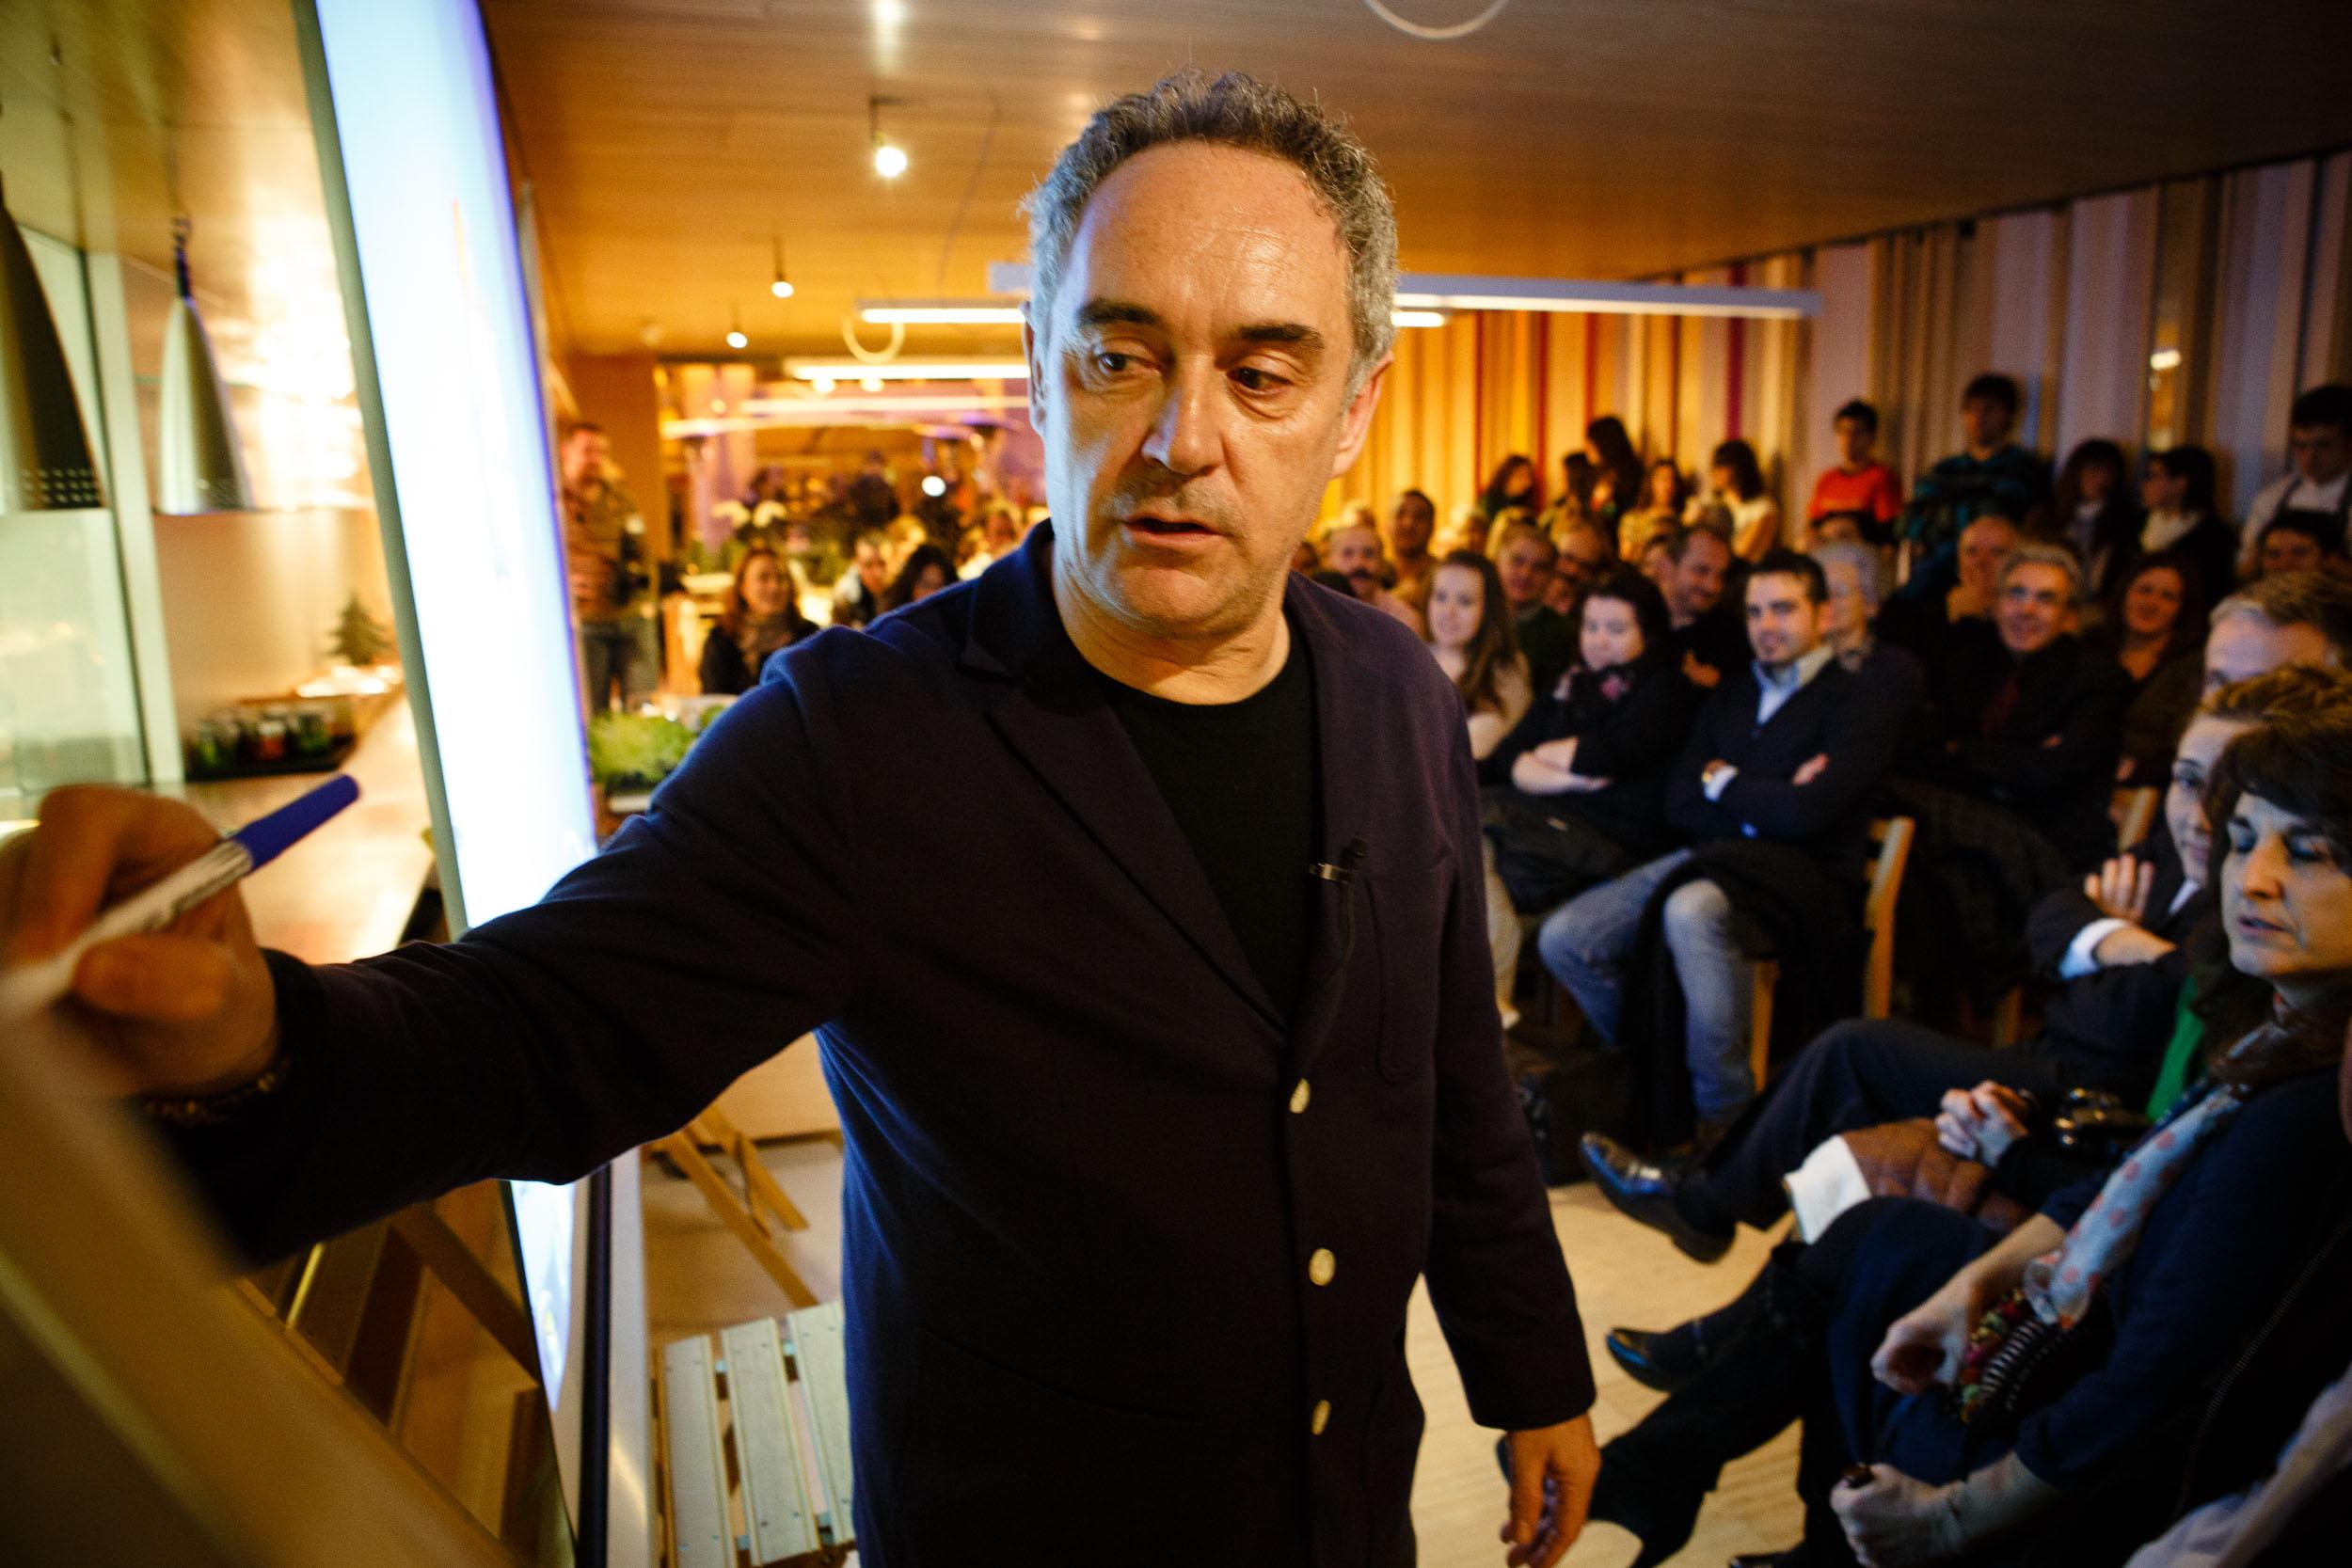 14/12/12 Ferran Adrià en Restaurante Tondeluna, Logroño, La Rioja. Foto por James Sturcke   www.sturcke.org